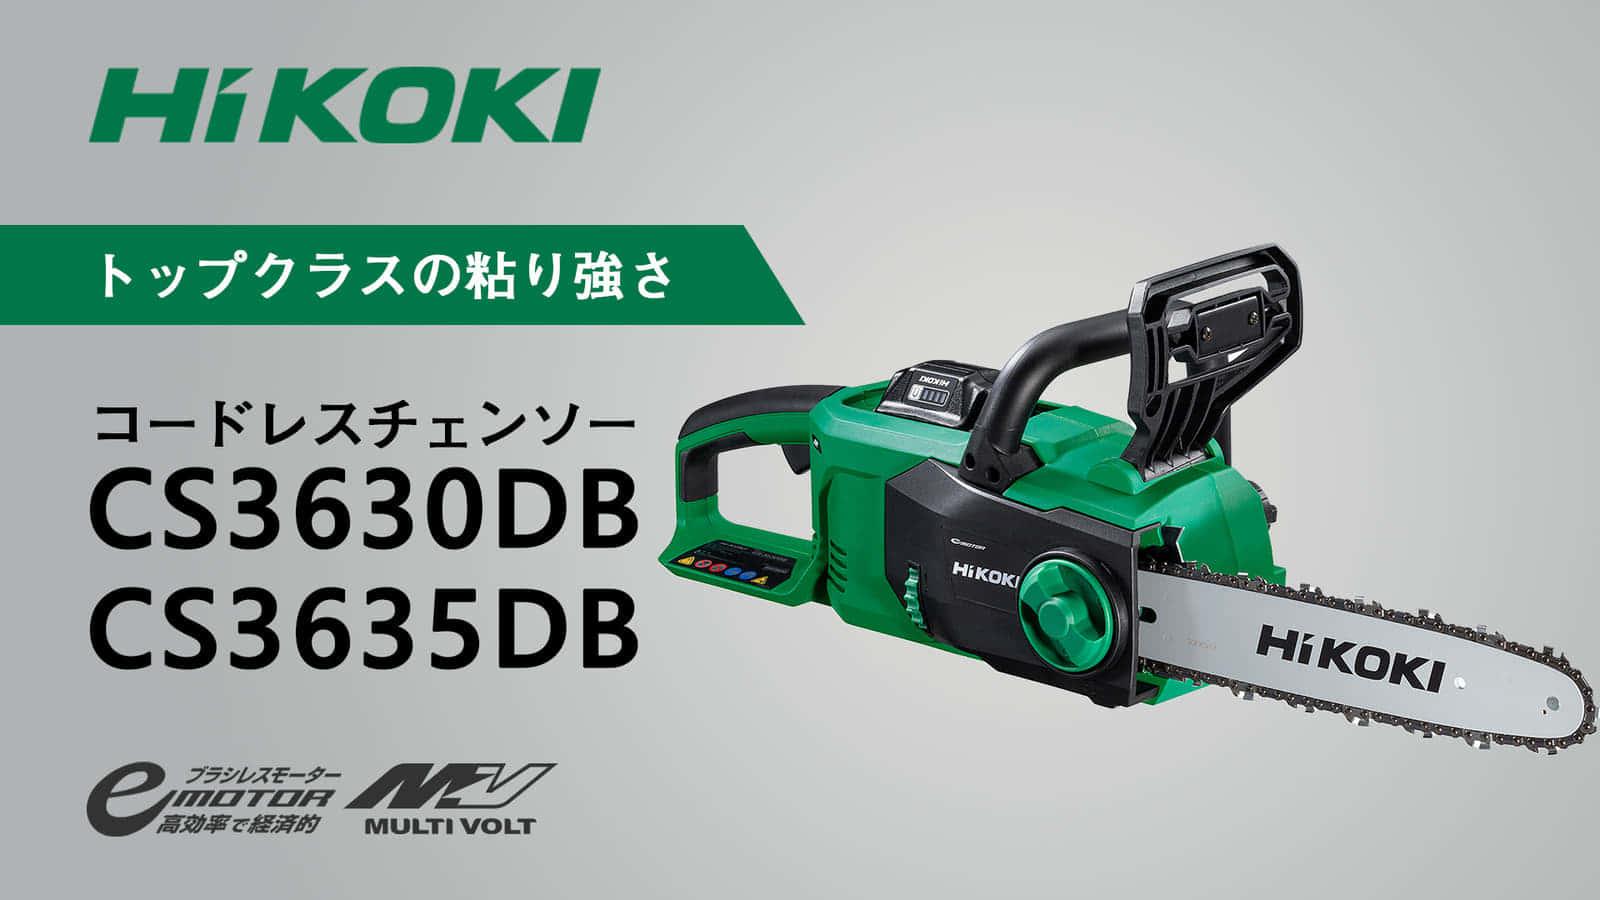 HiKOKI CS3630DB/CS3635DB コードレスチェンソーを発売